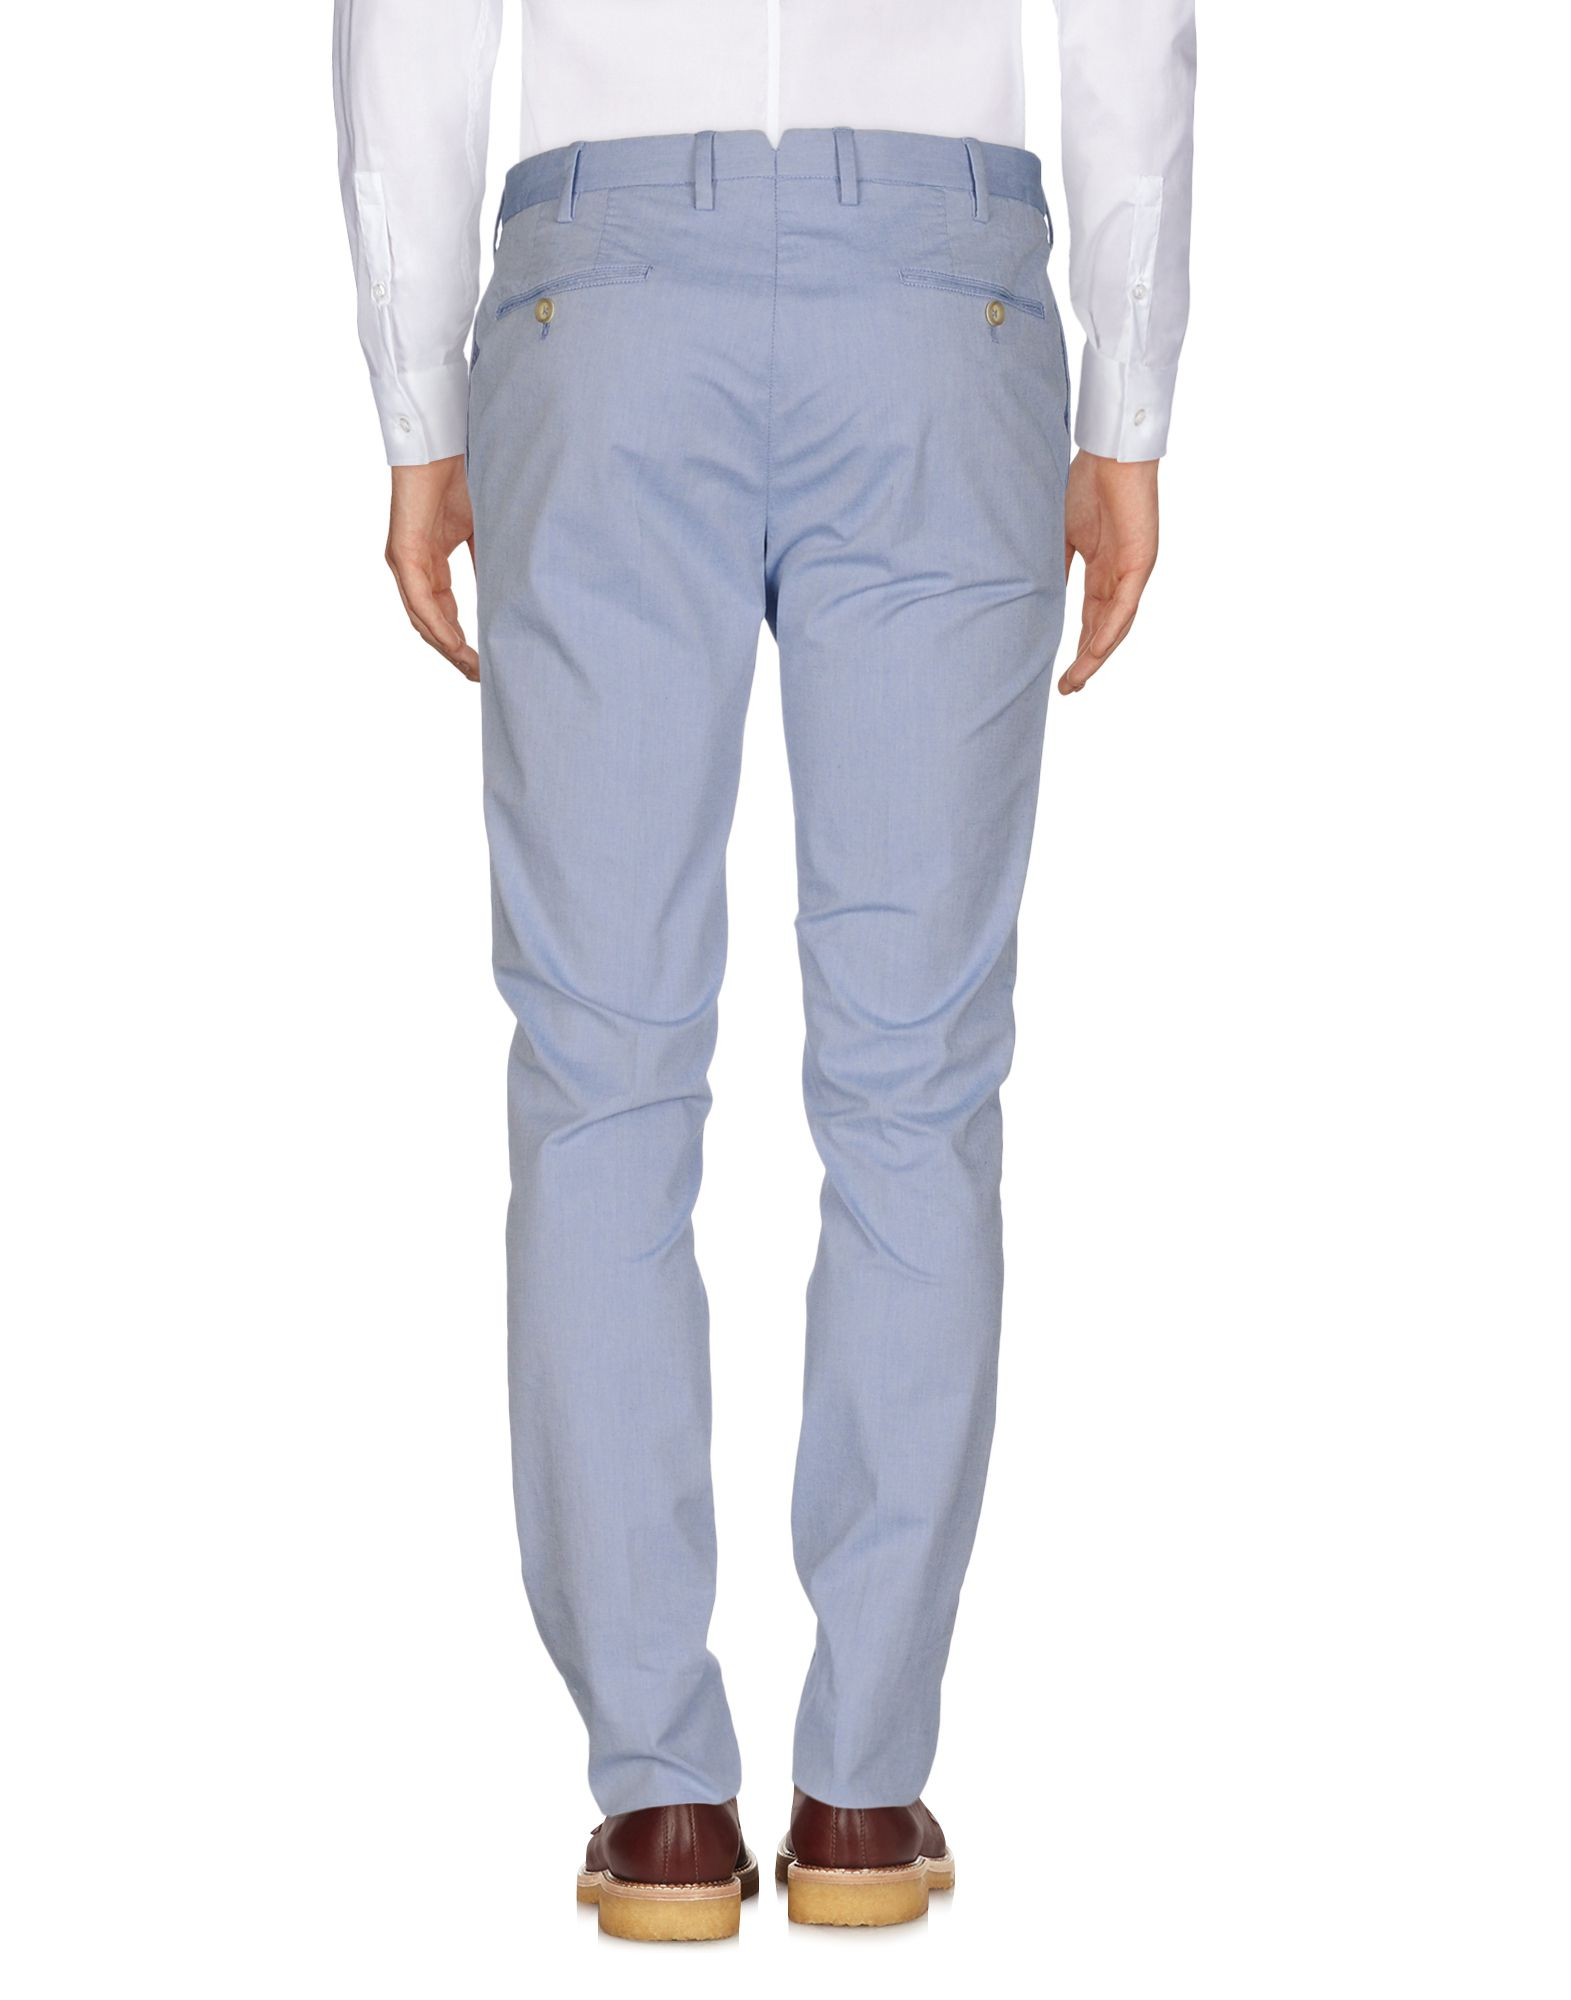 A - buon mercato Pantalone Pt01 Uomo - A 13134717SR 1a3d4c